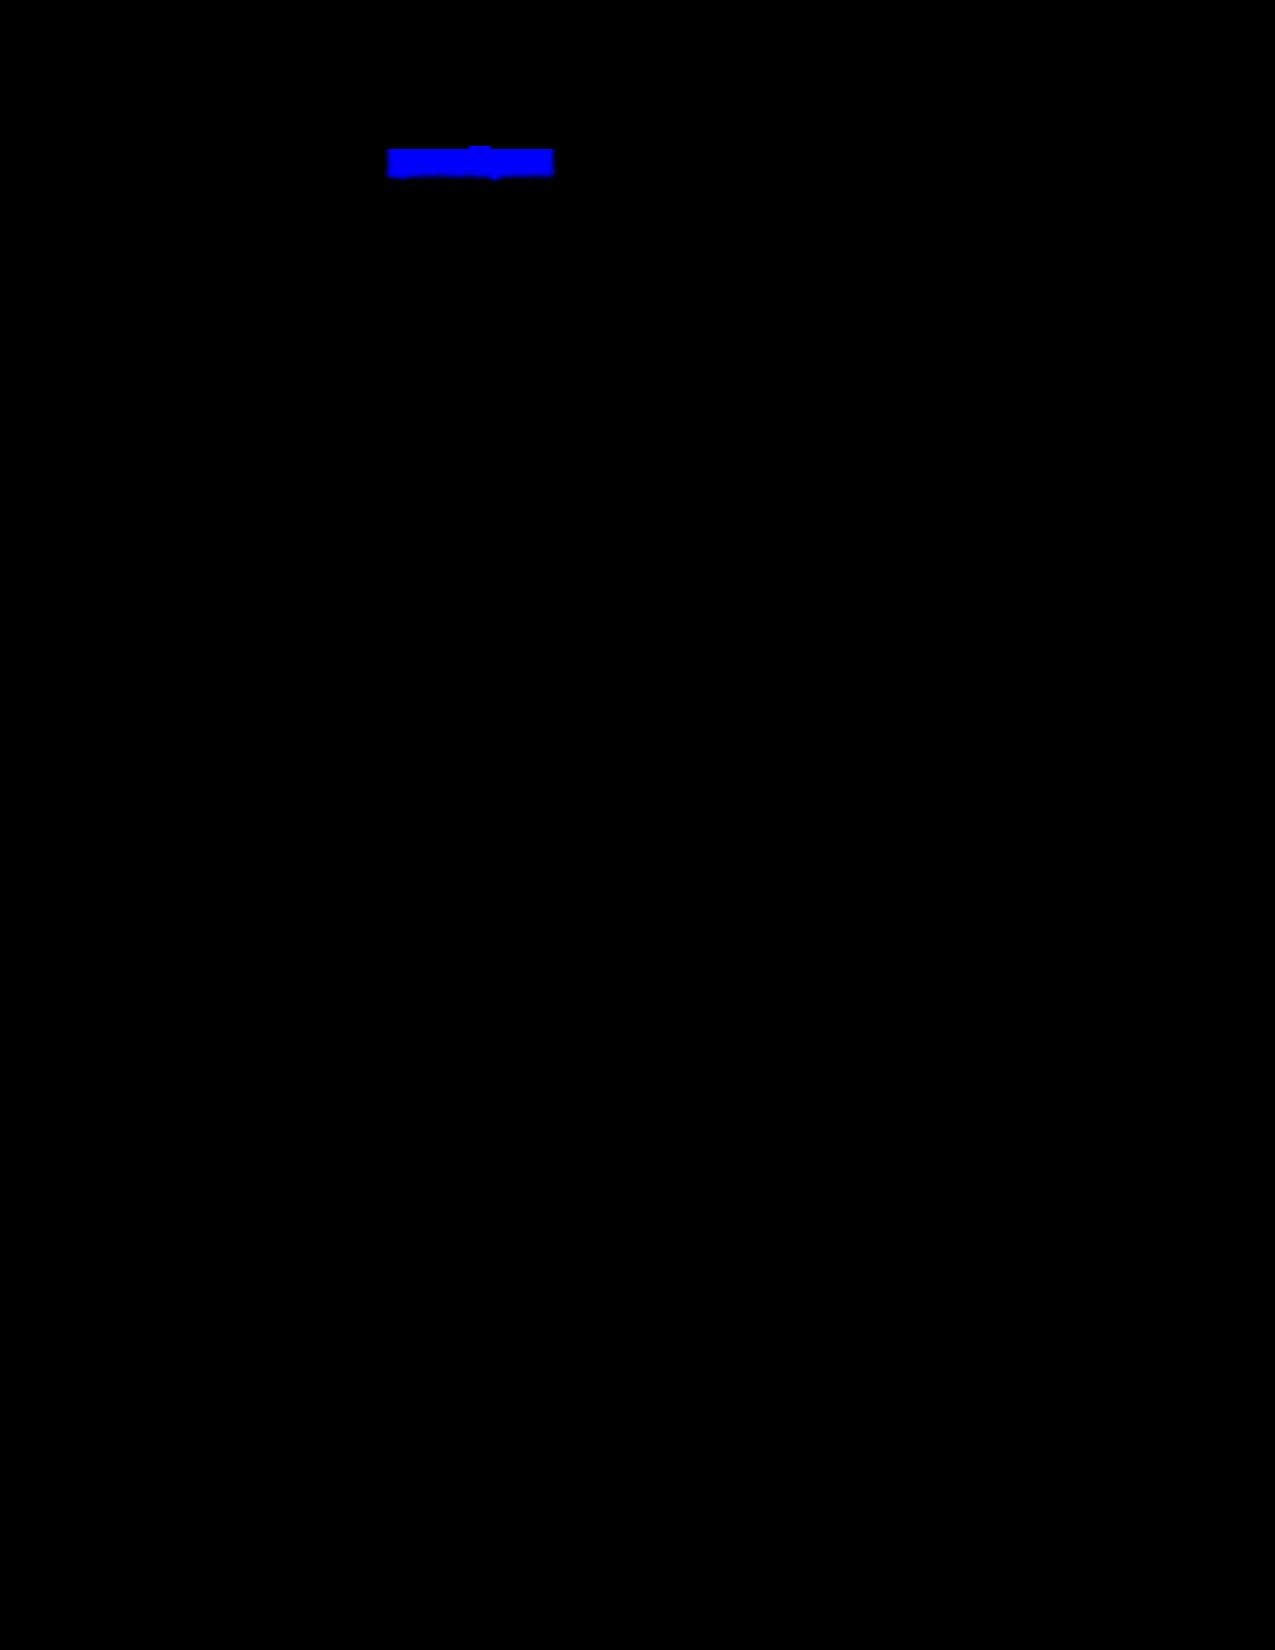 lee corporation equity acc 545 Anthony lee dba 88 ice cream, 87 1074 huamoa st, waianae anthony tacon   barrington capital corp, 5000 birch st #600, newport beach, ca barro,  anthony, 945  bell, kristl c, 204 sand island acc bell, marsha l, 106   chung, leilani l & michael a, 47-545 melekula rd, kaneohe chung, nathan .